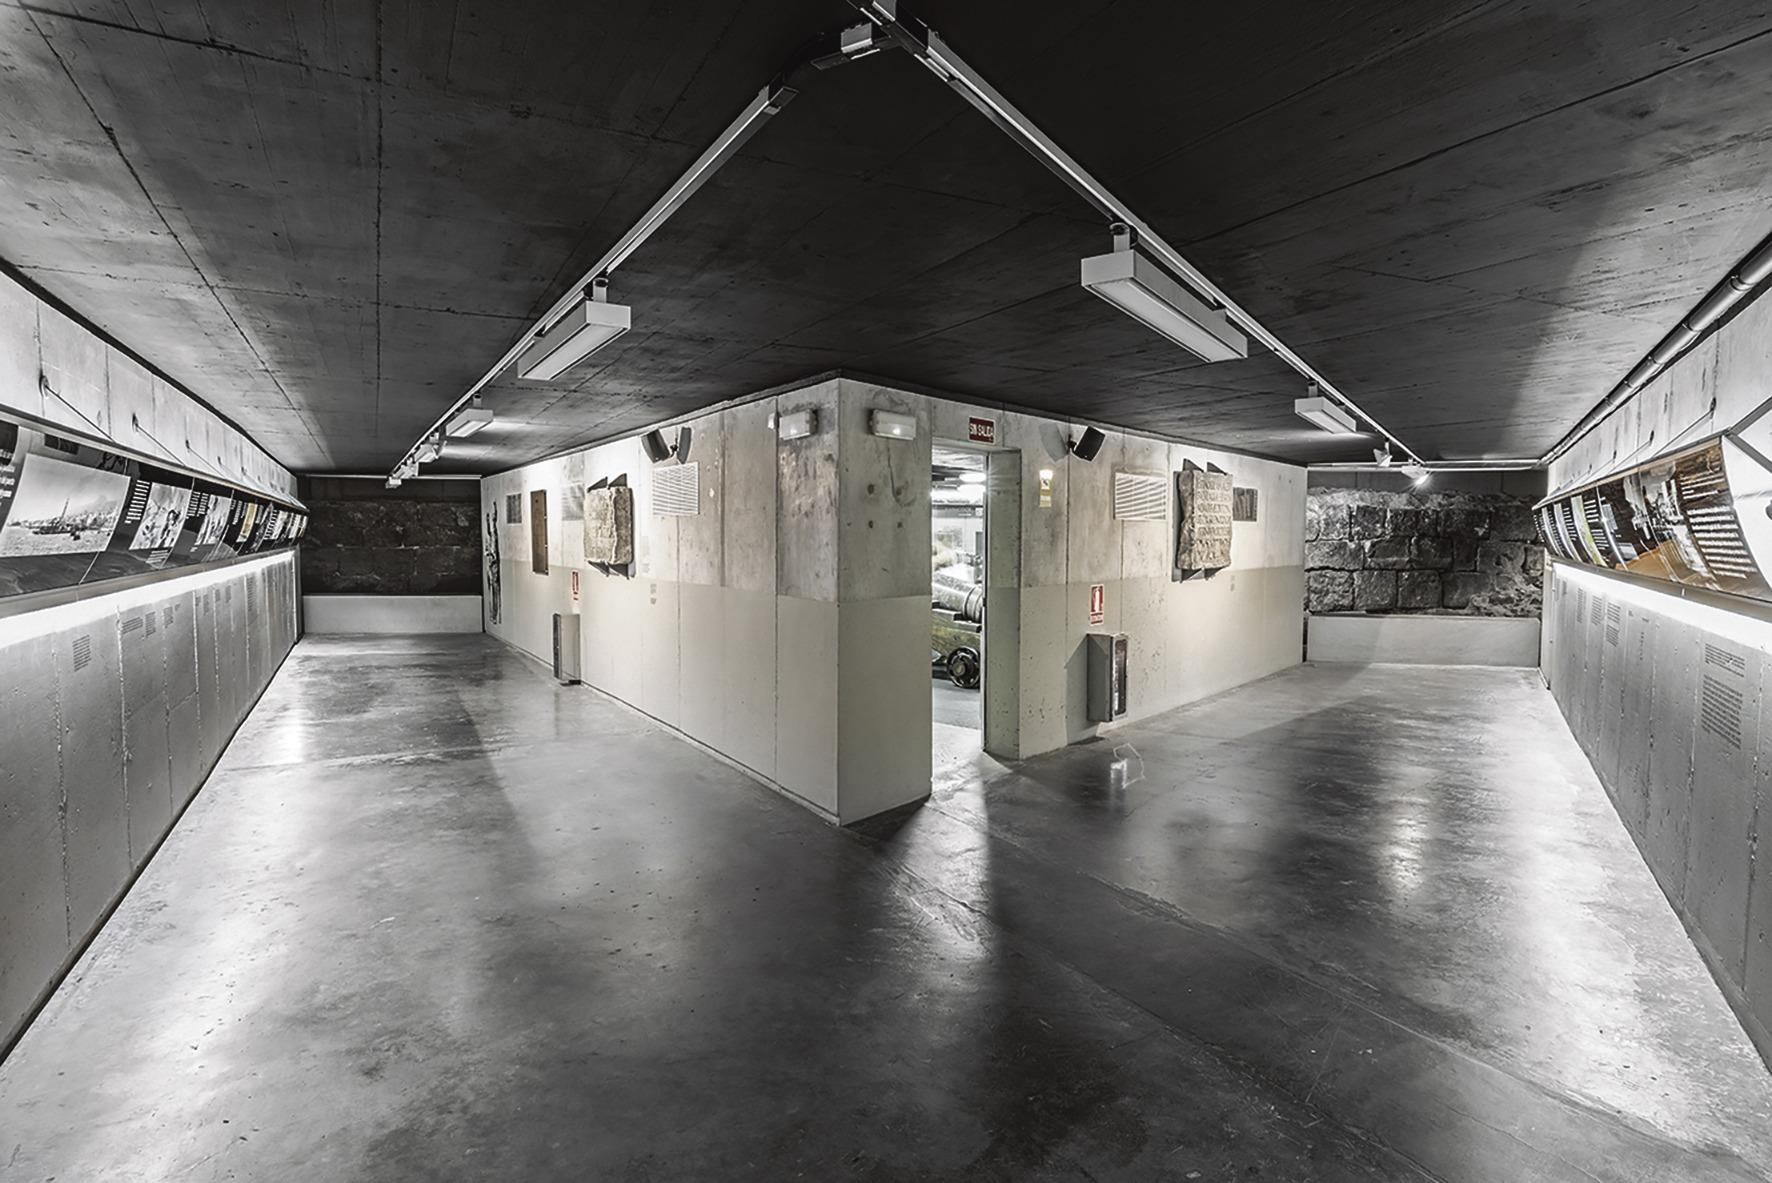 ischen Galerie ist kostenlos. Foto: Cabildo de Tenerife